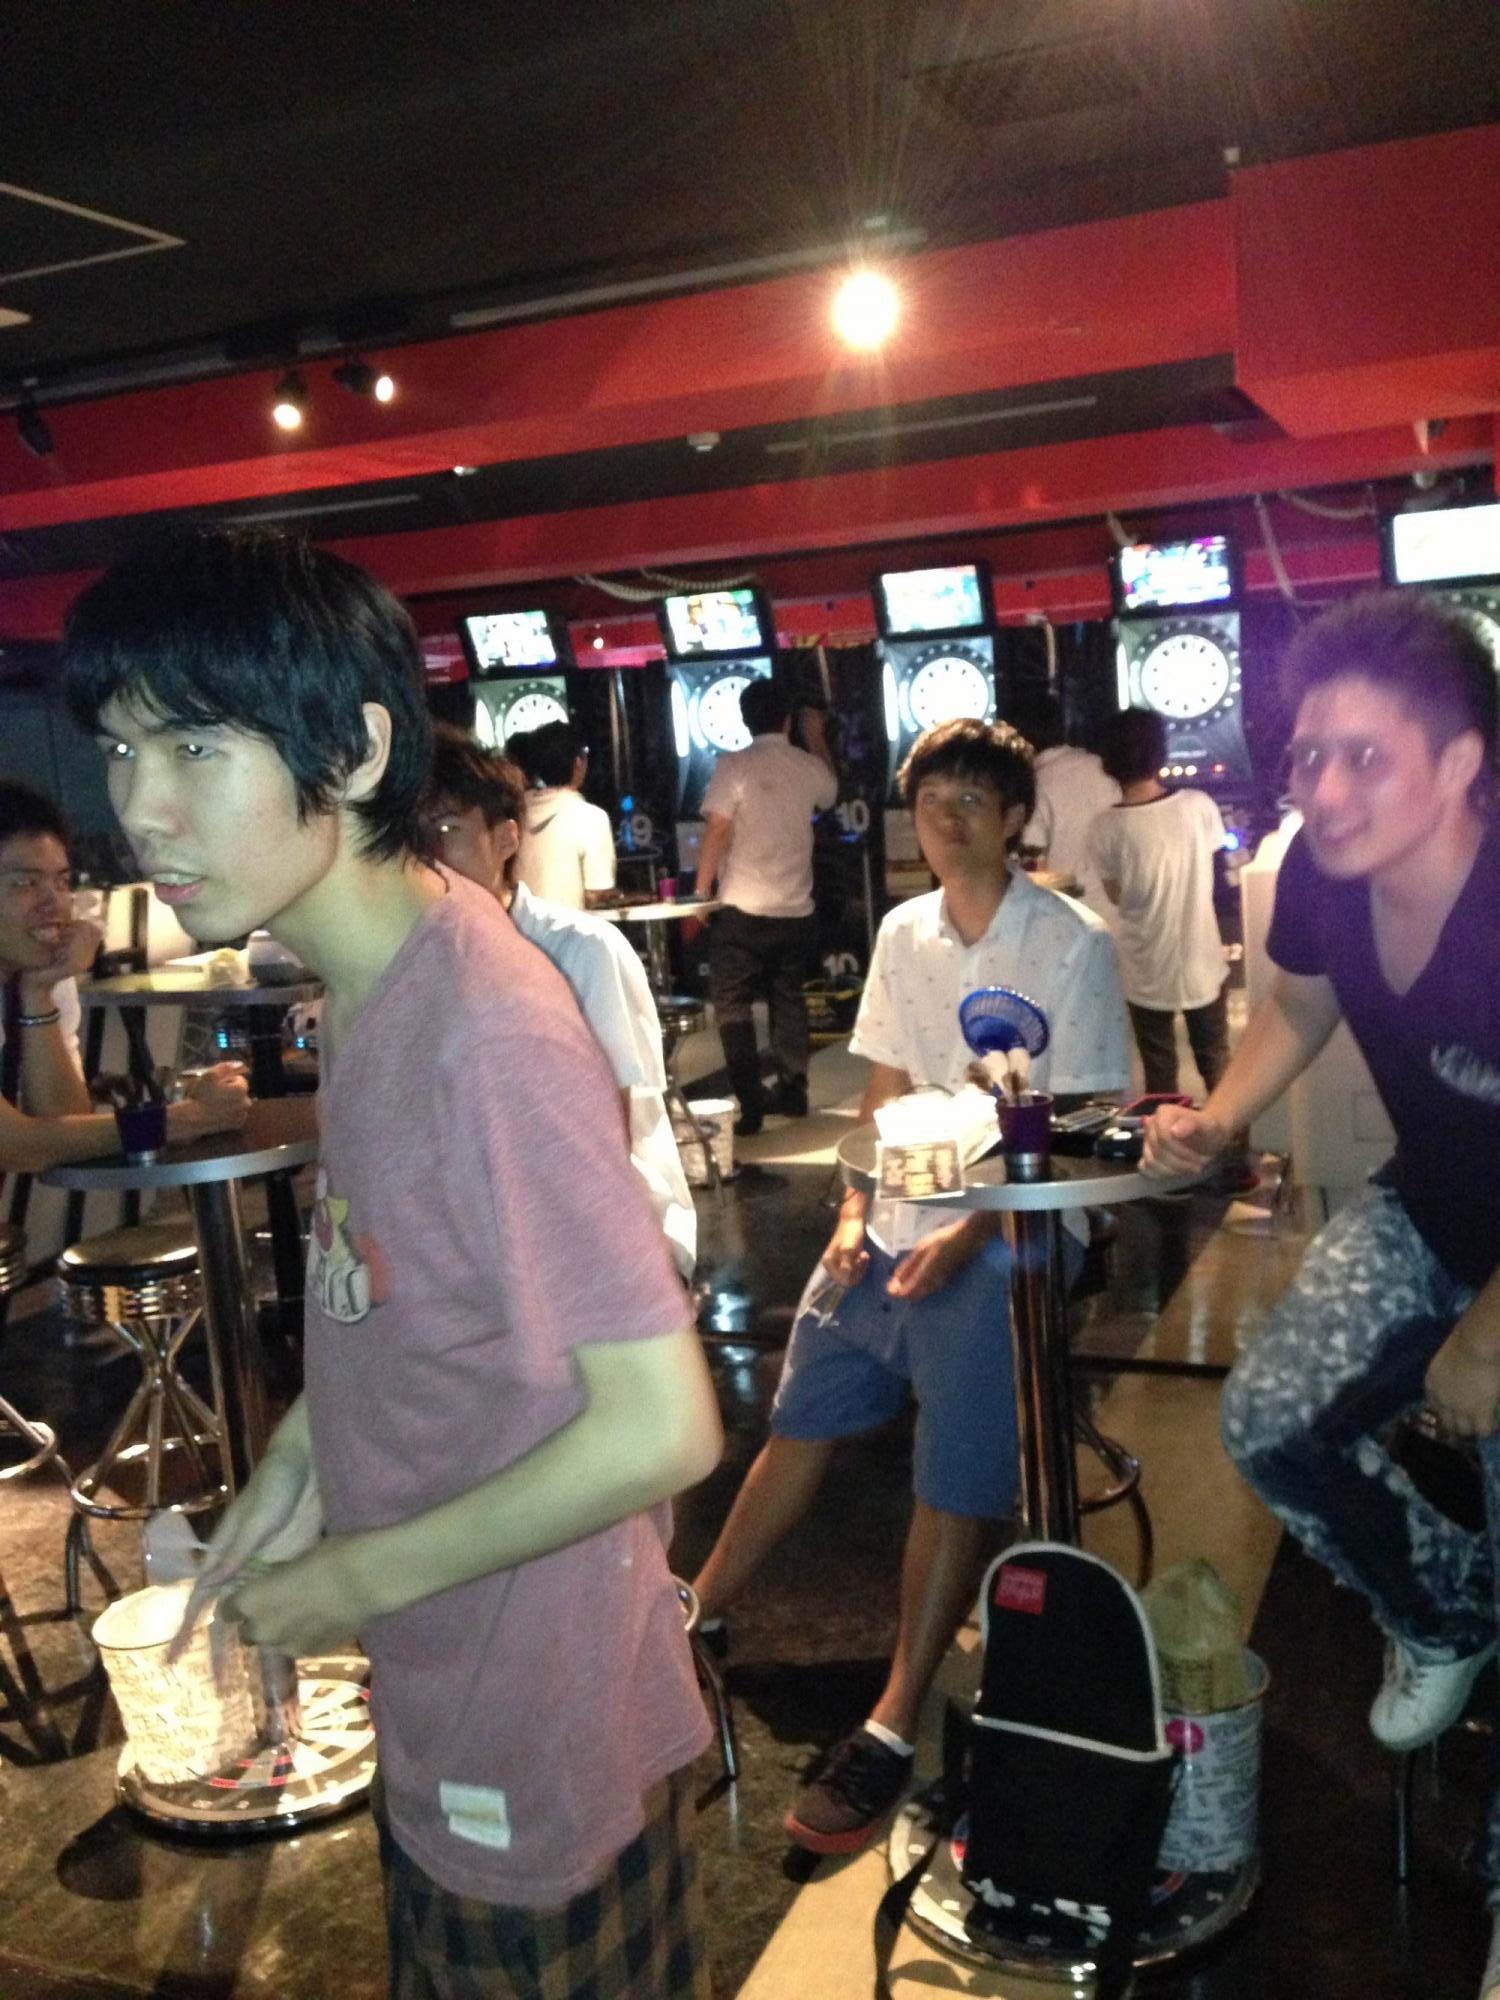 photo_convert_20130812121721.jpg